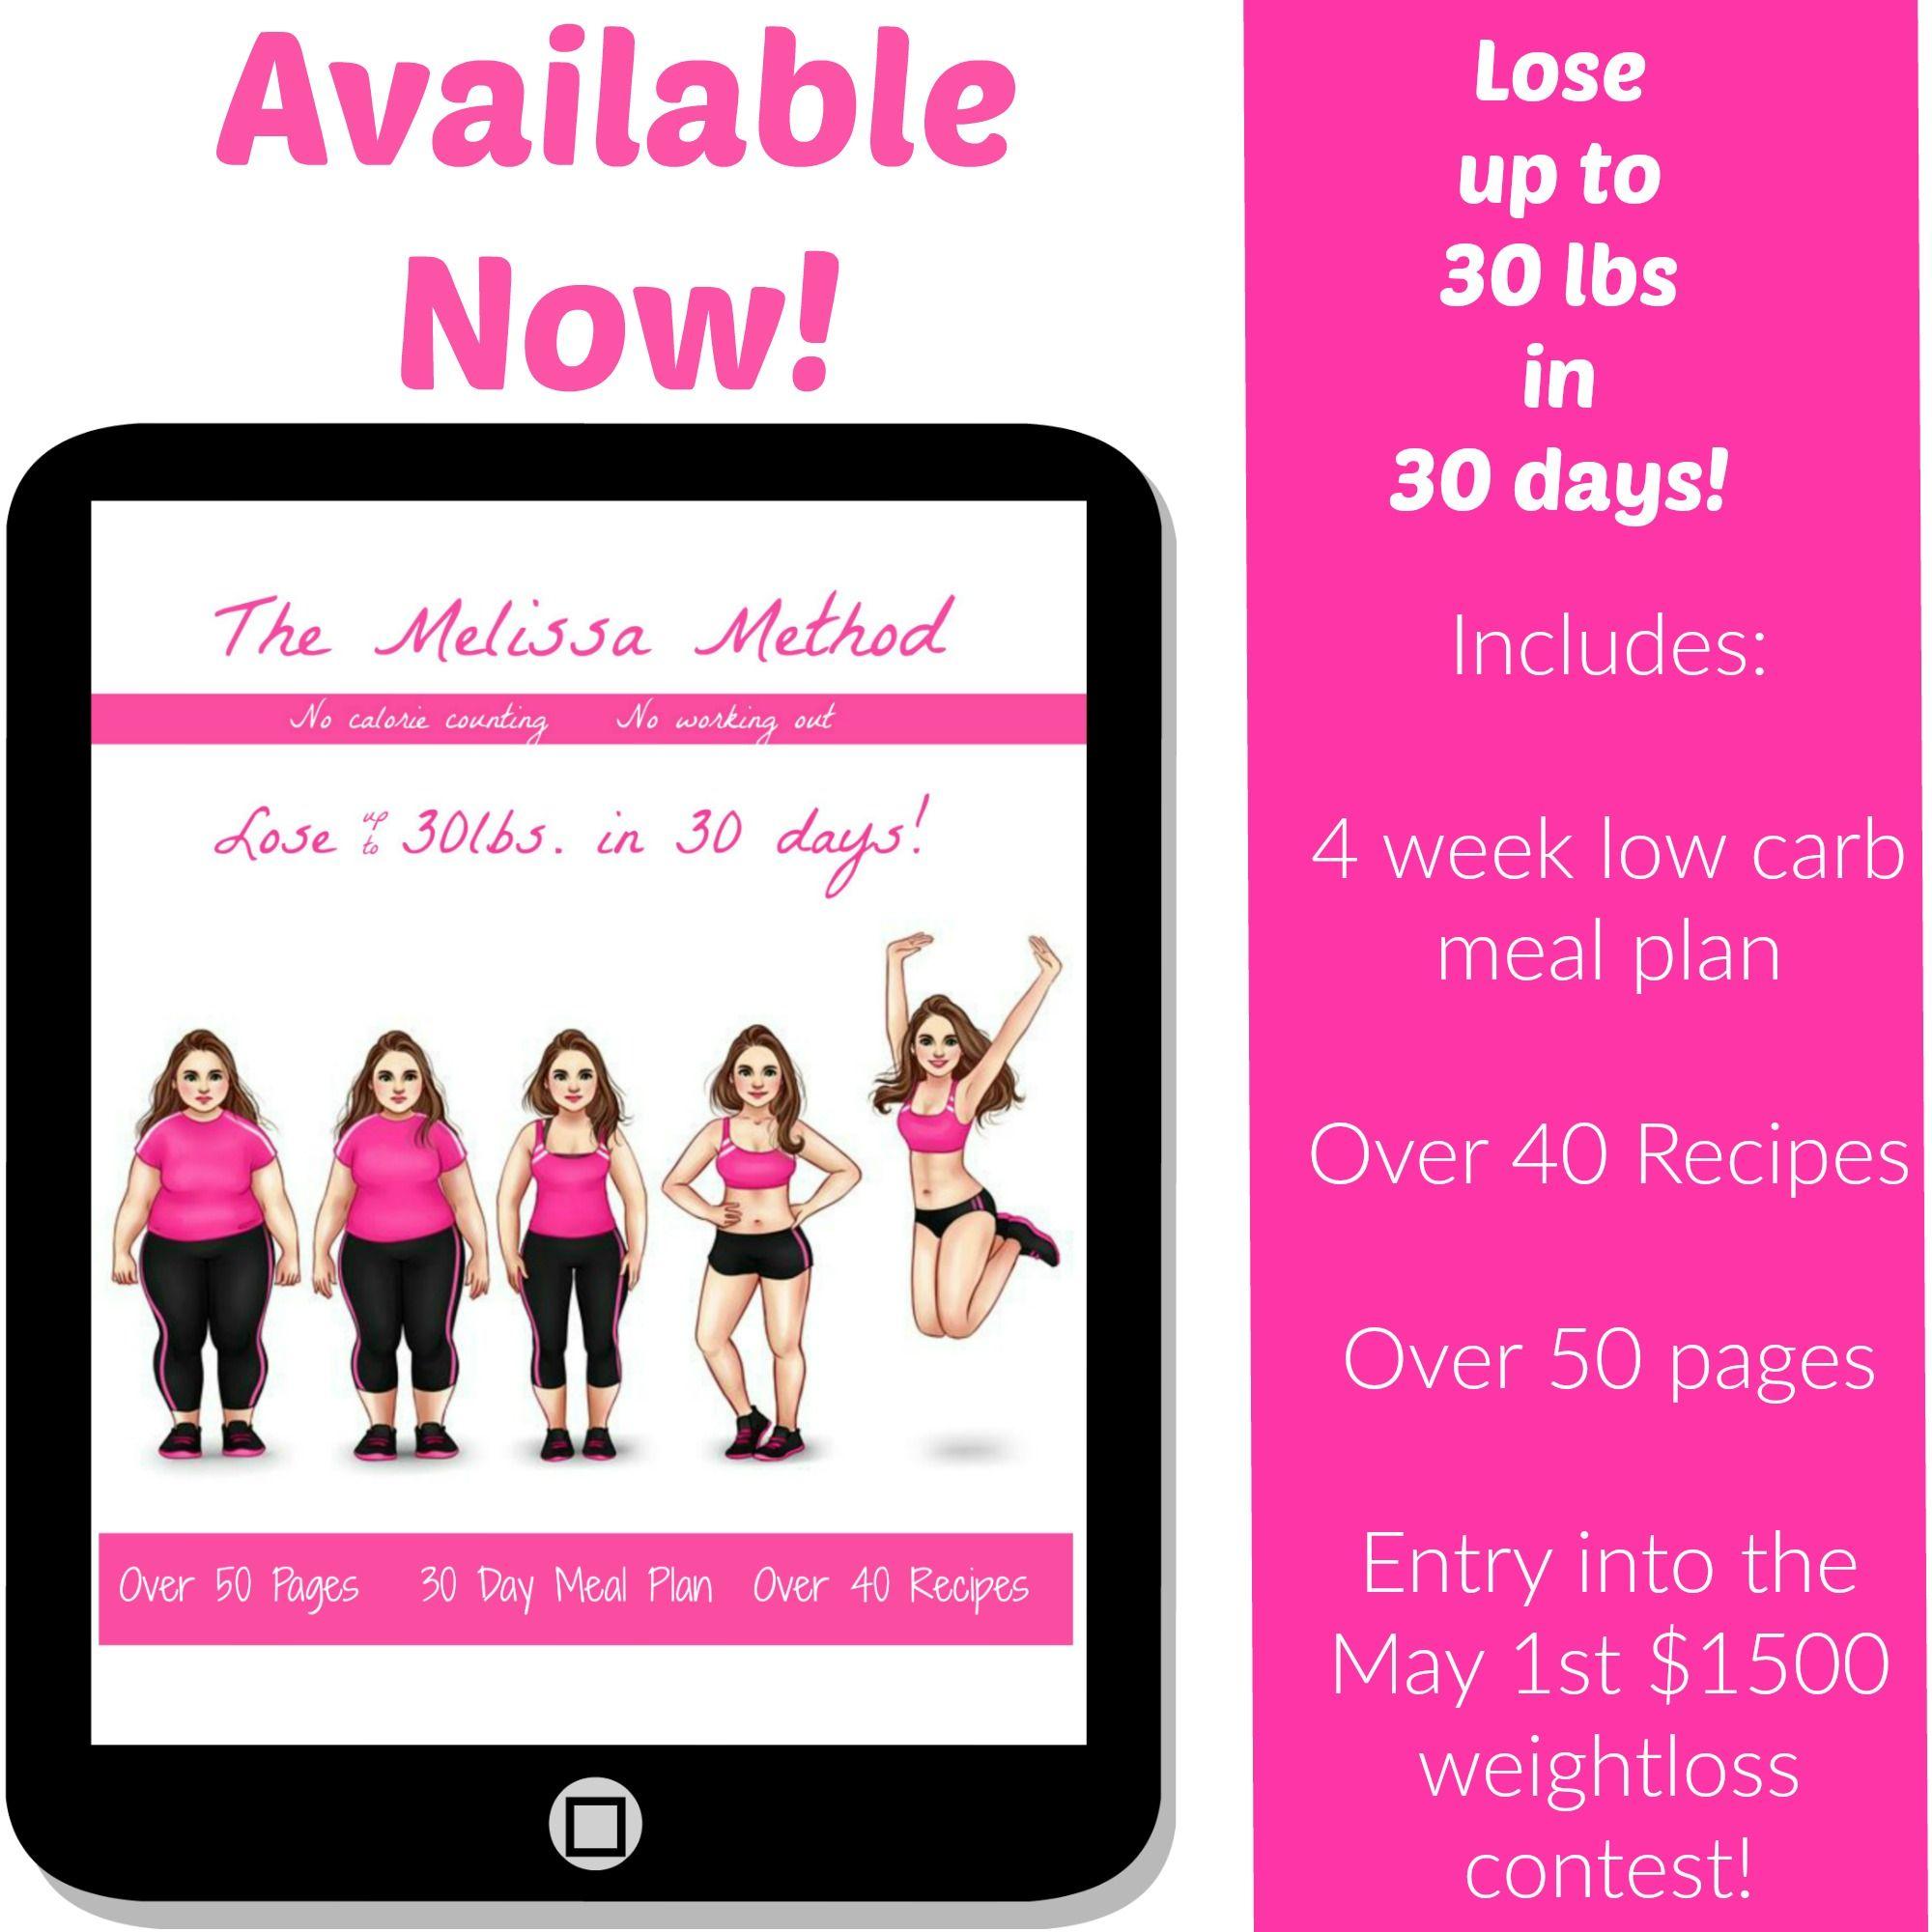 Weight loss life coach uk